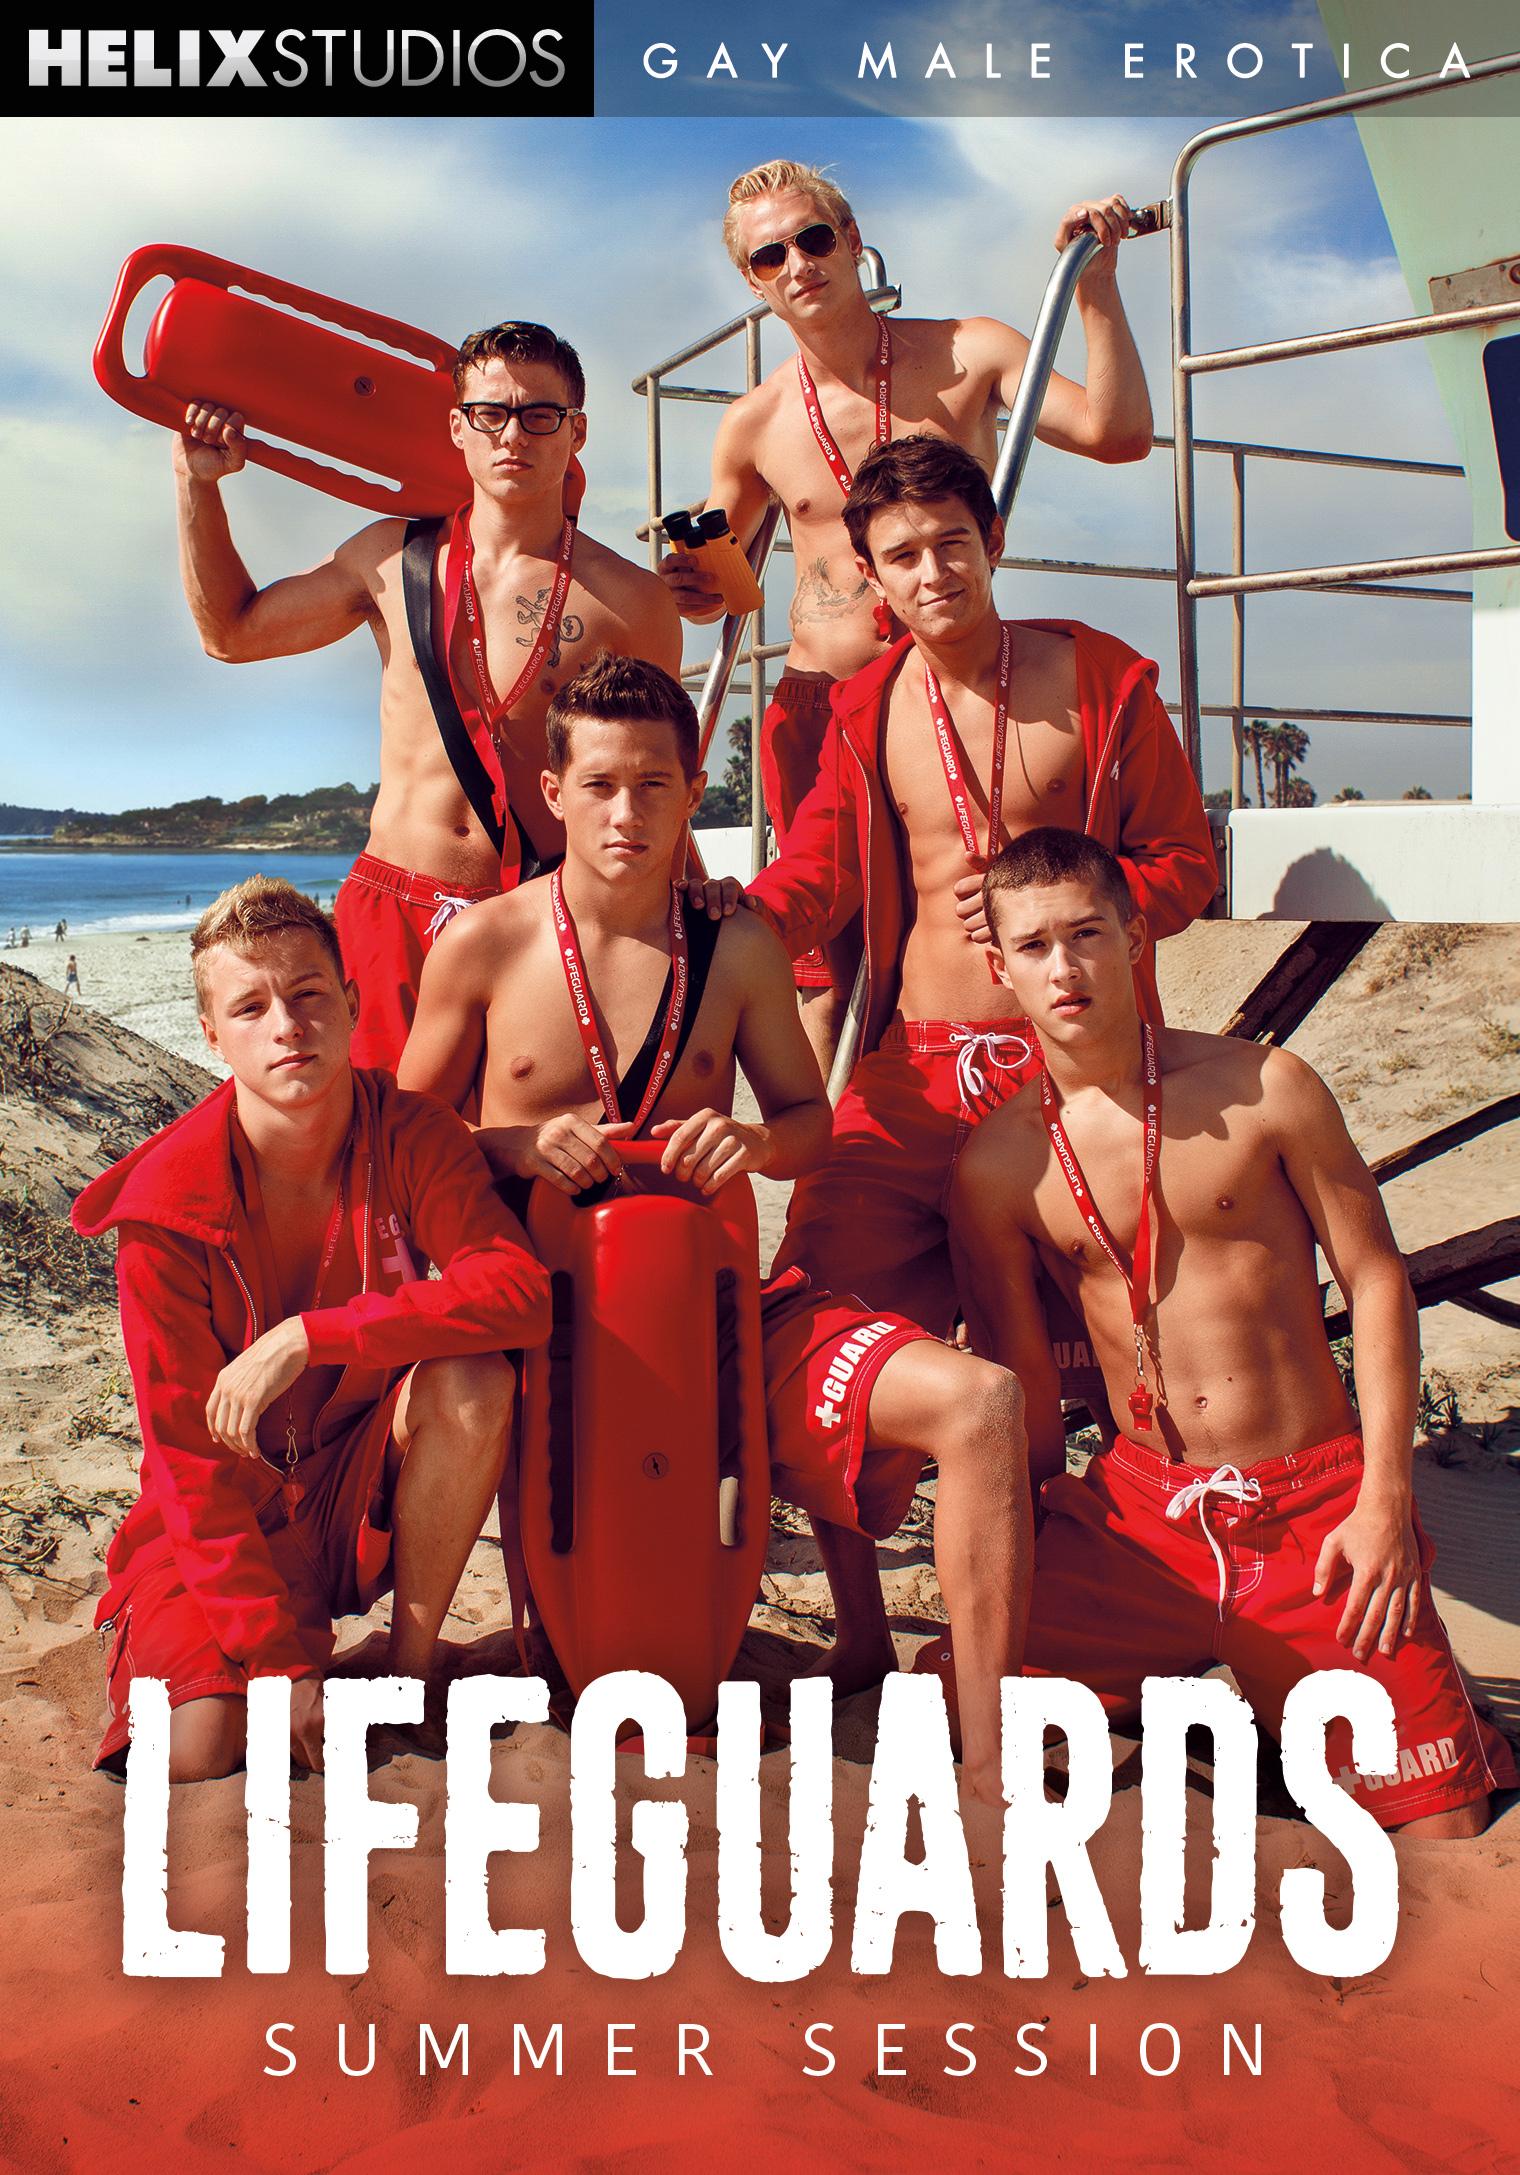 from Luis gay sex lifeguard